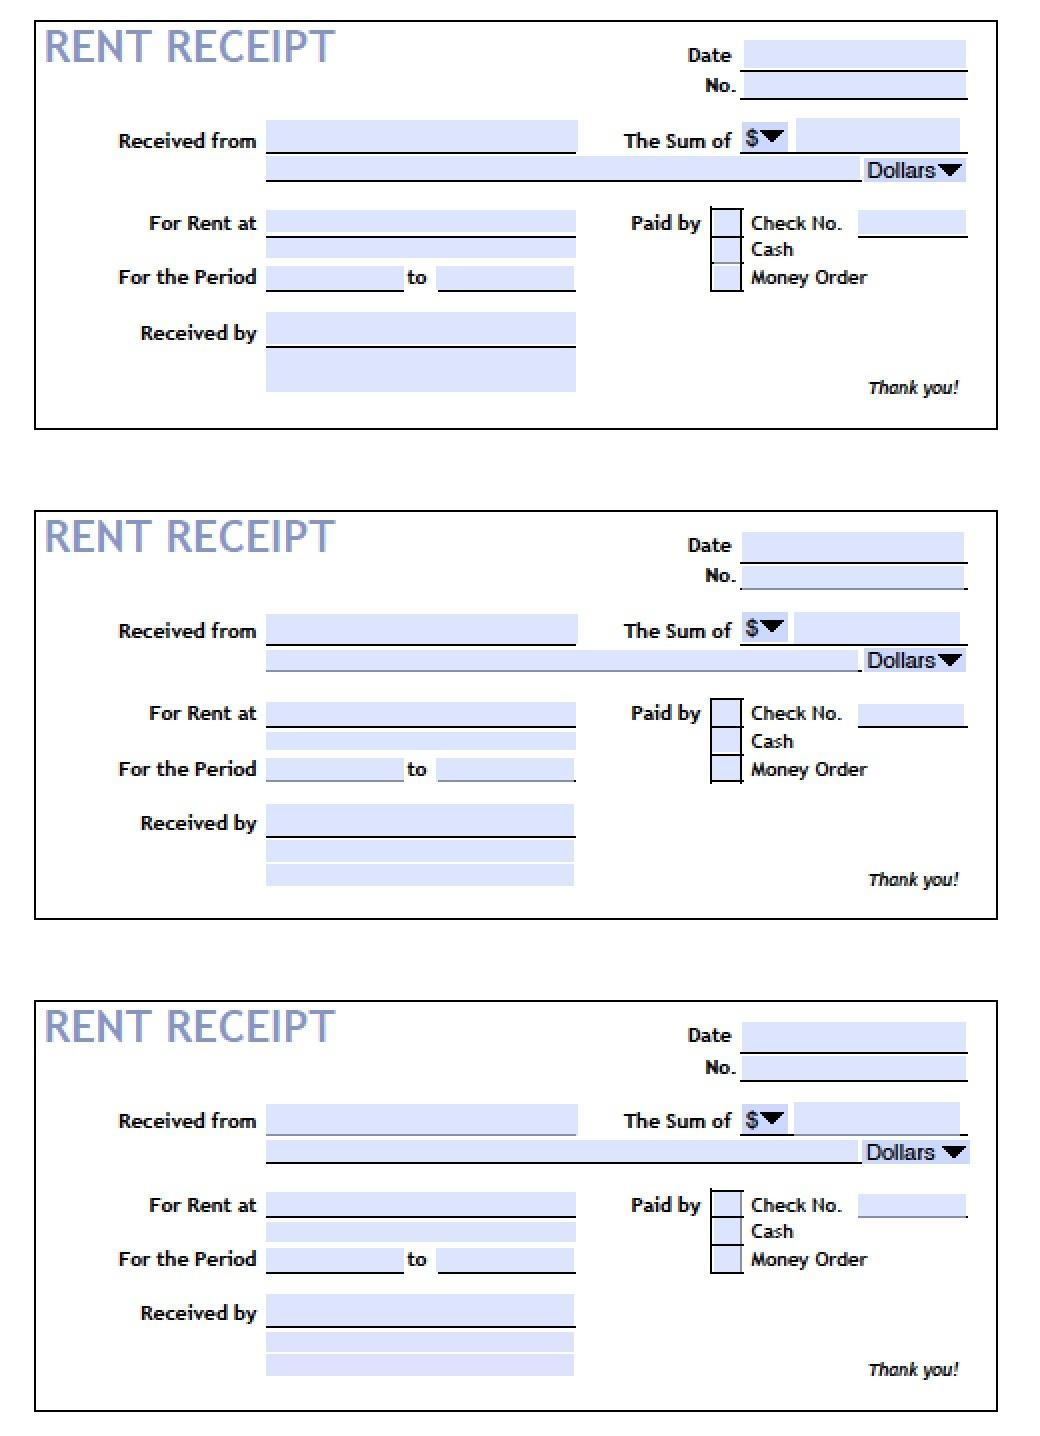 Download Printable Rent Receipt Templates   Pdf   Word   Excel - Free Printable Rent Receipt